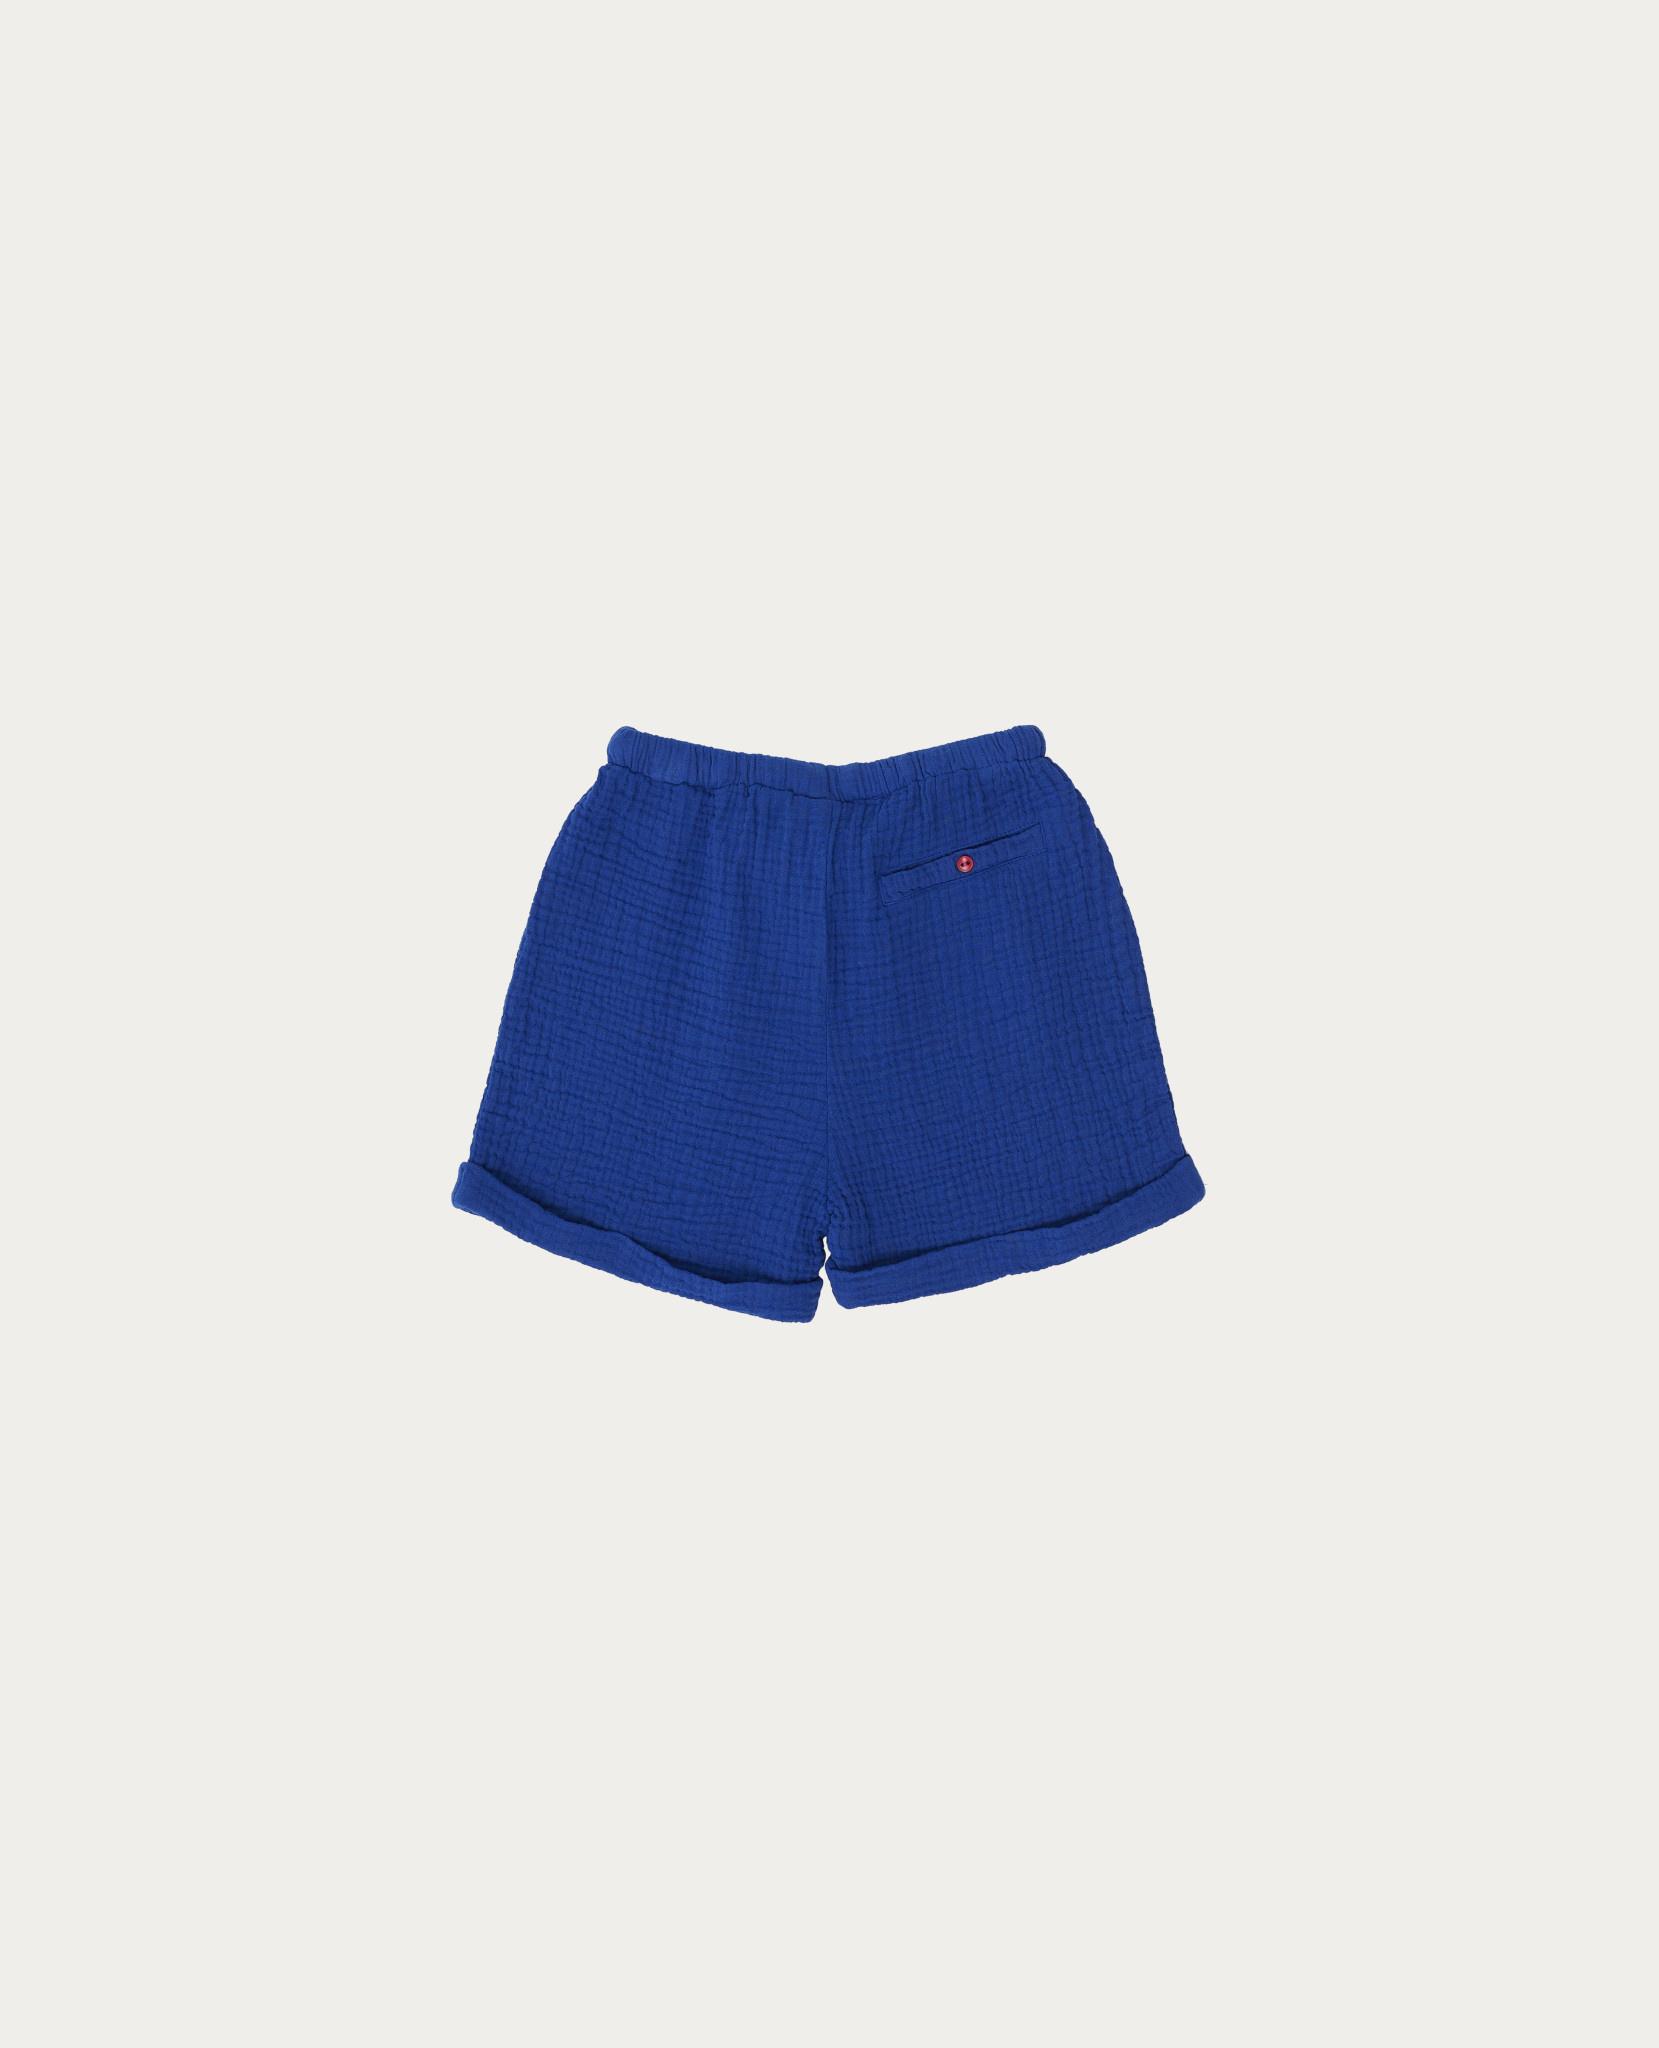 Blue bambula short-1